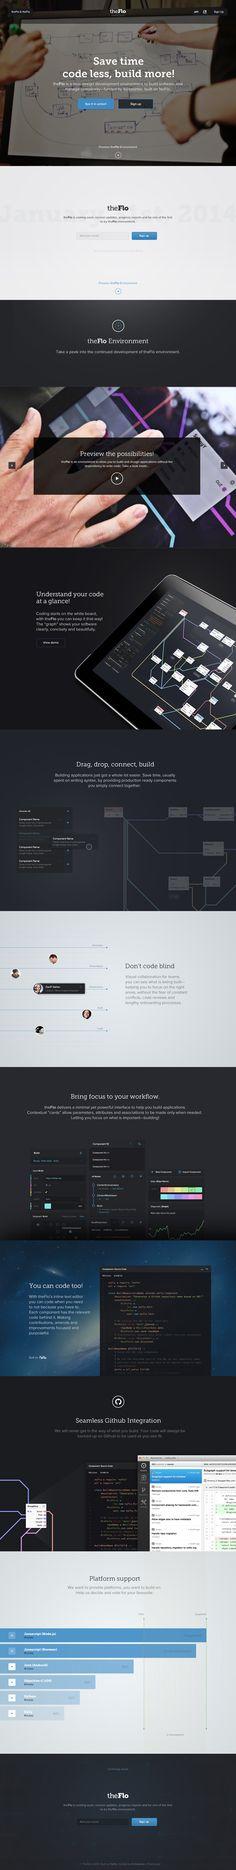 Theflo, great project funded by Kickstarer : http://www.kickstarter.com/projects/noflo/noflo-development-environment